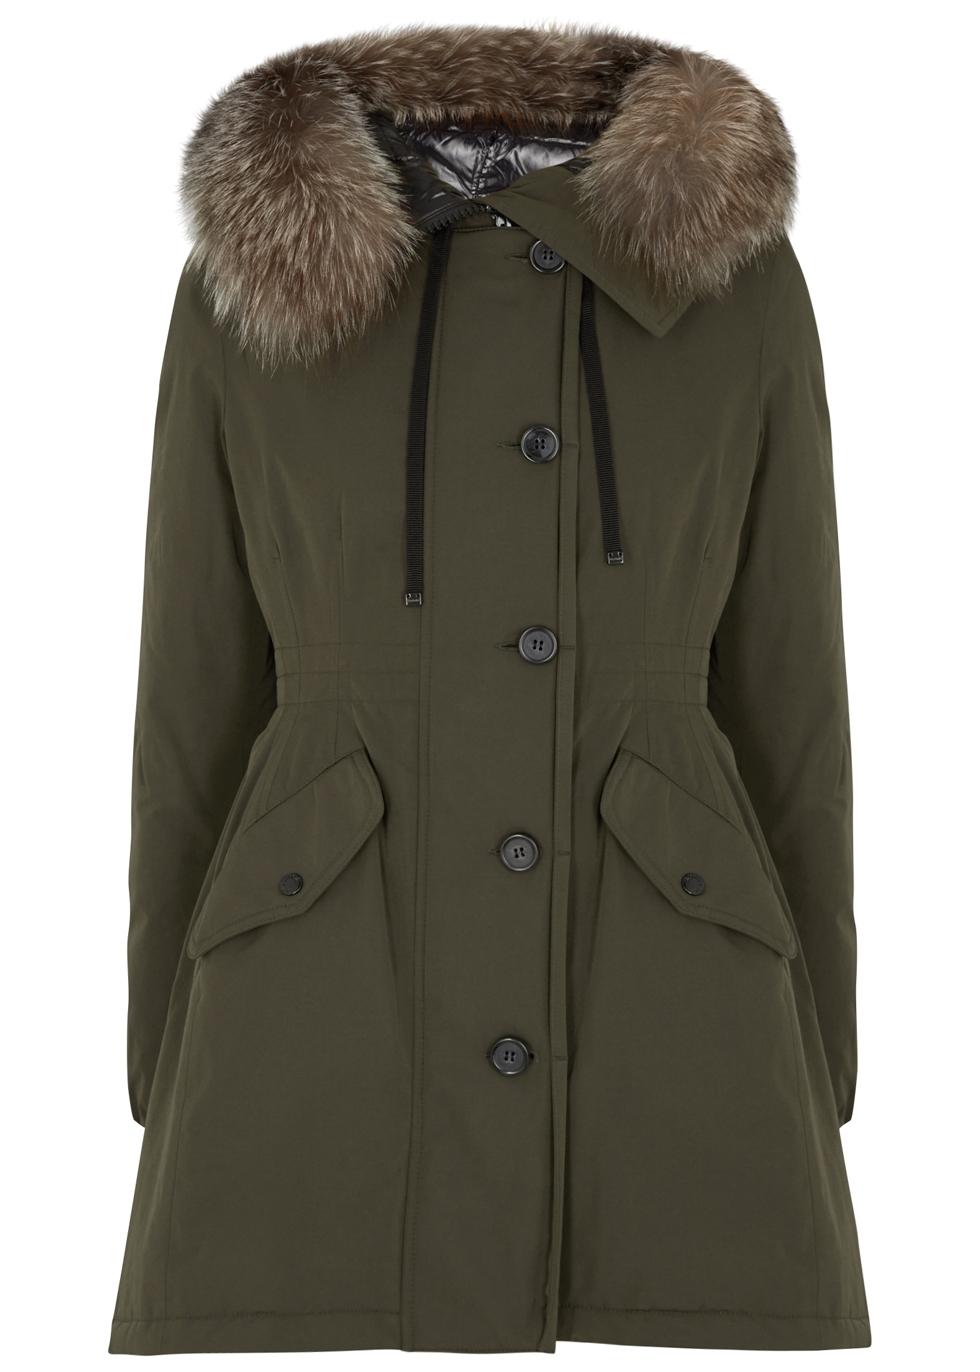 Monticole fur-trimmed twill coat - Moncler